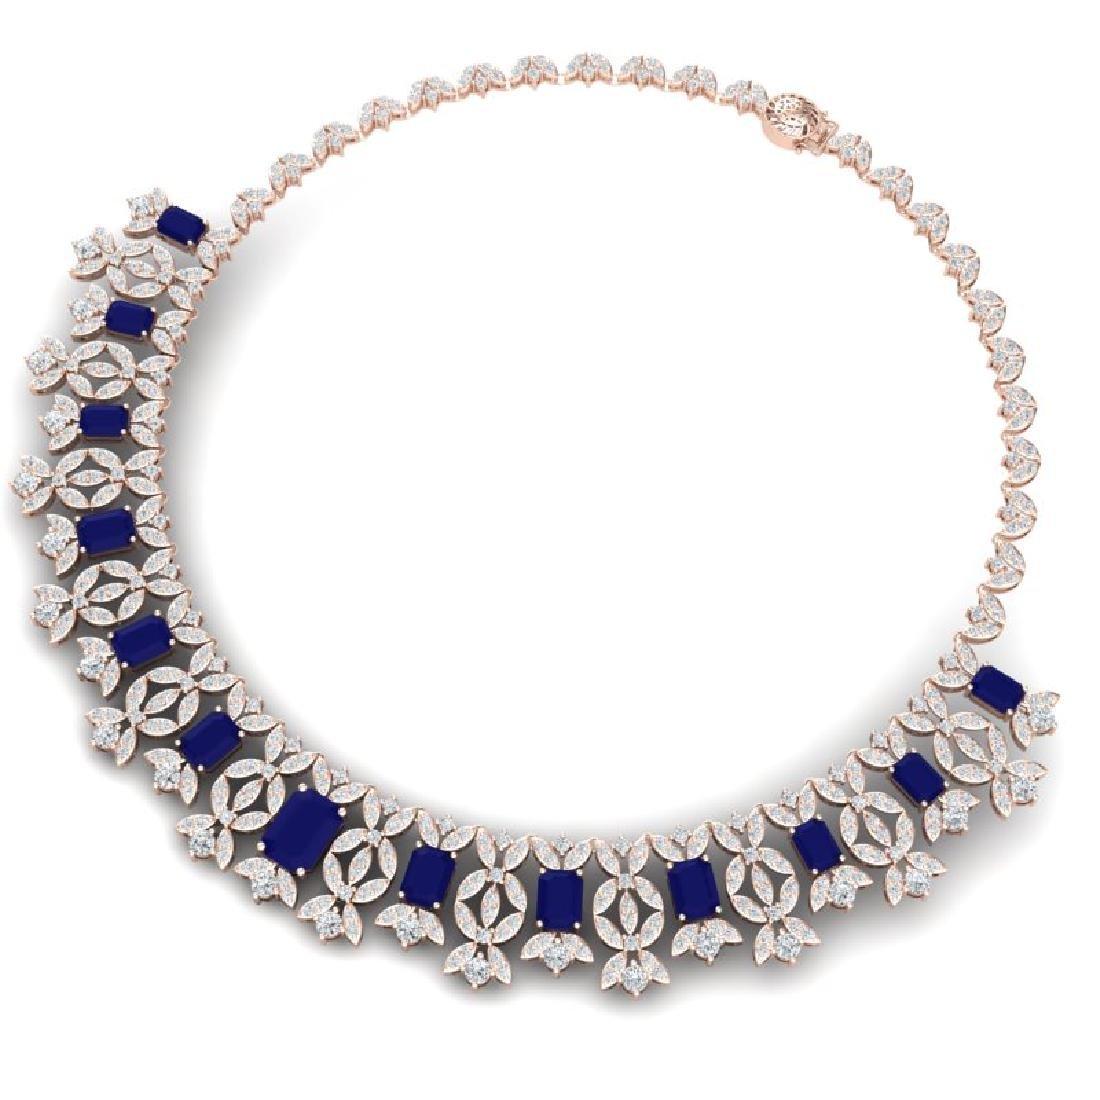 50.44 CTW Royalty Sapphire & VS Diamond Necklace 18K - 3